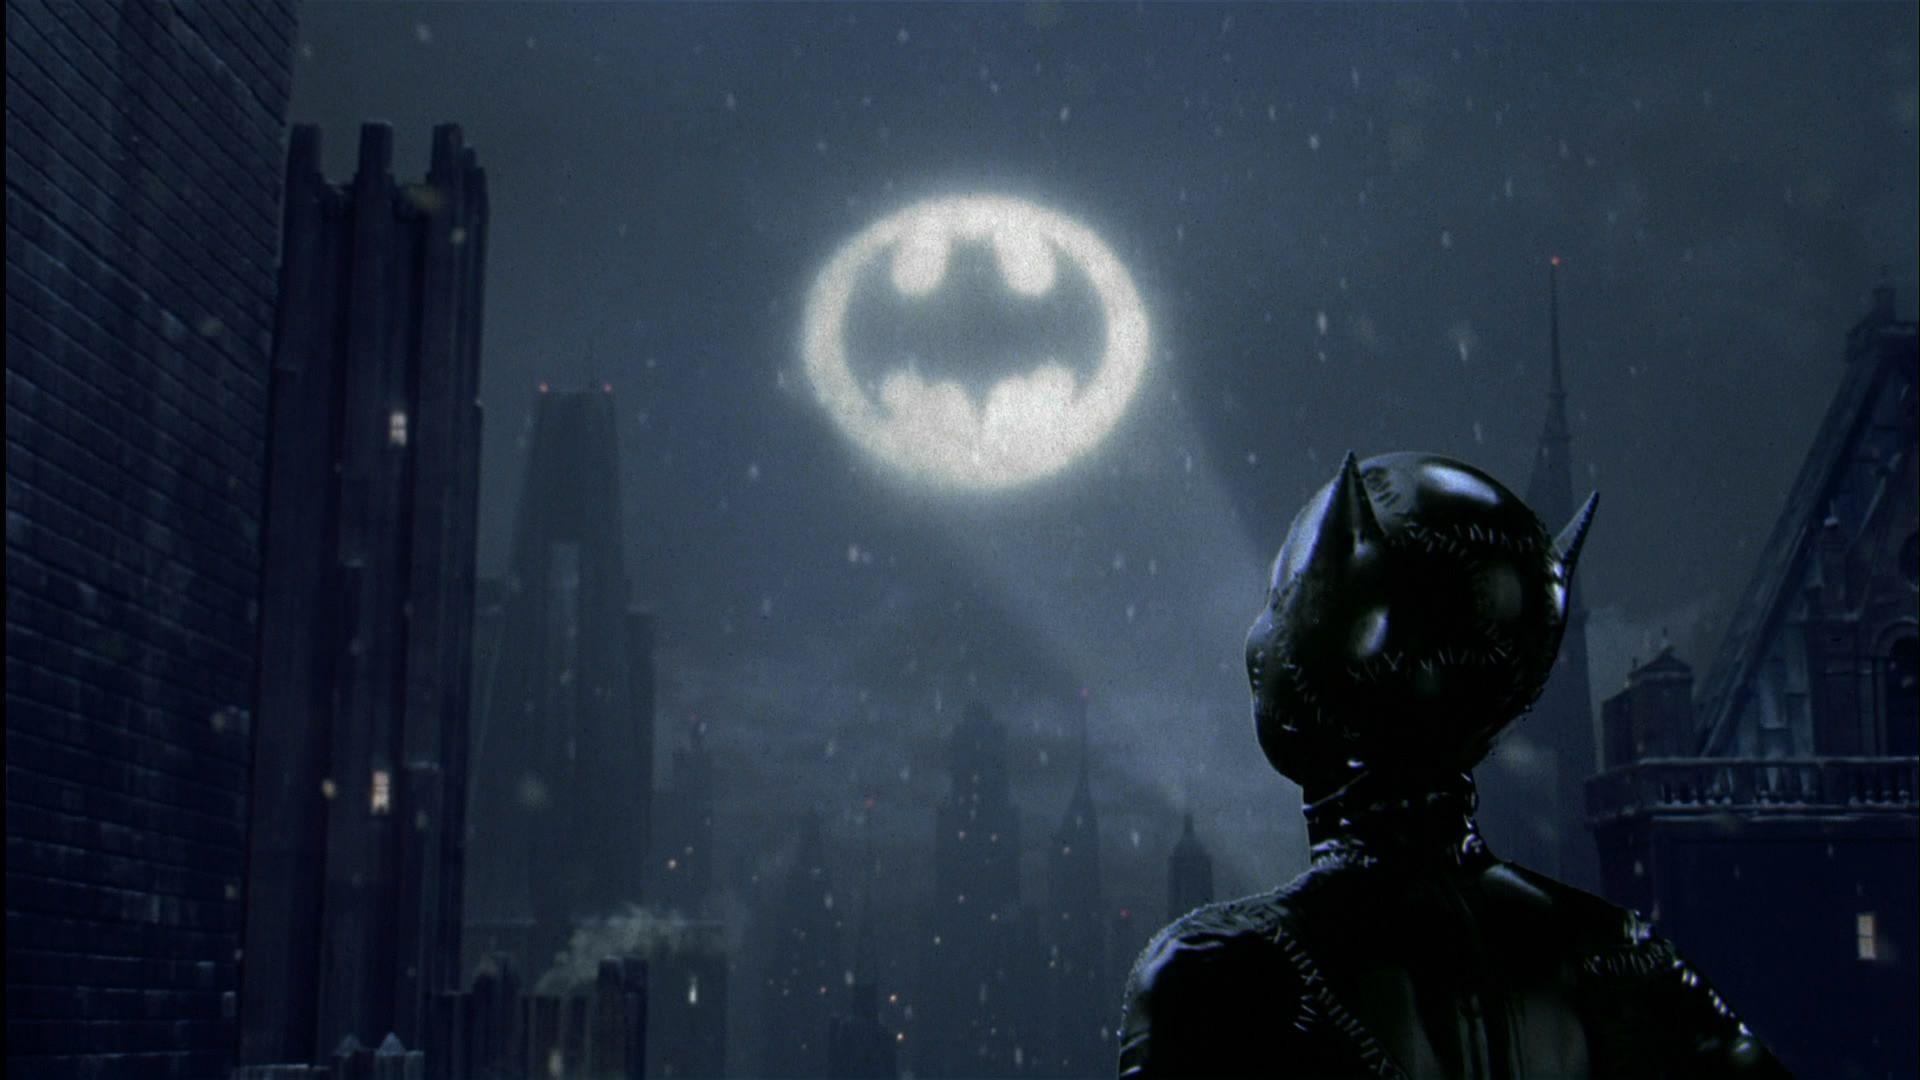 Logos For > Bat Signal Wallpaper